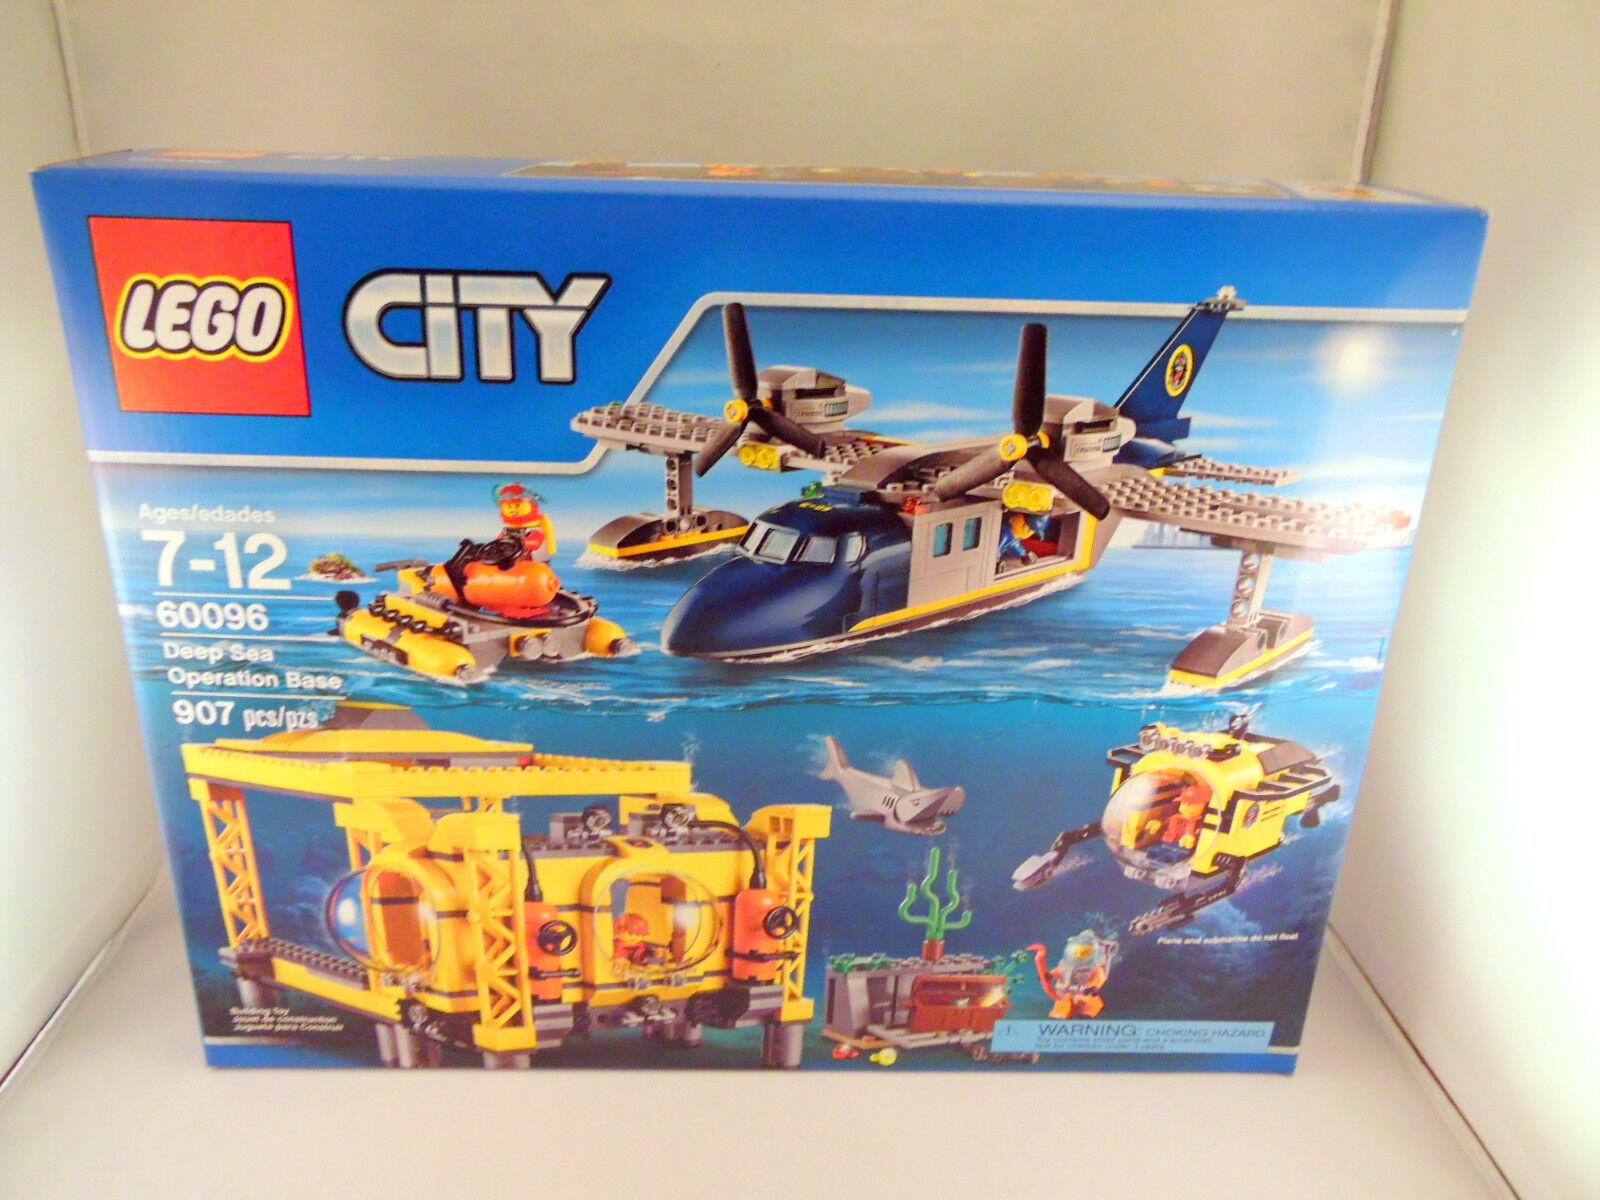 Lego 60096 Deep  Sea Operation Base - 2015 - nuovo - Sealed  fino al 50% di sconto